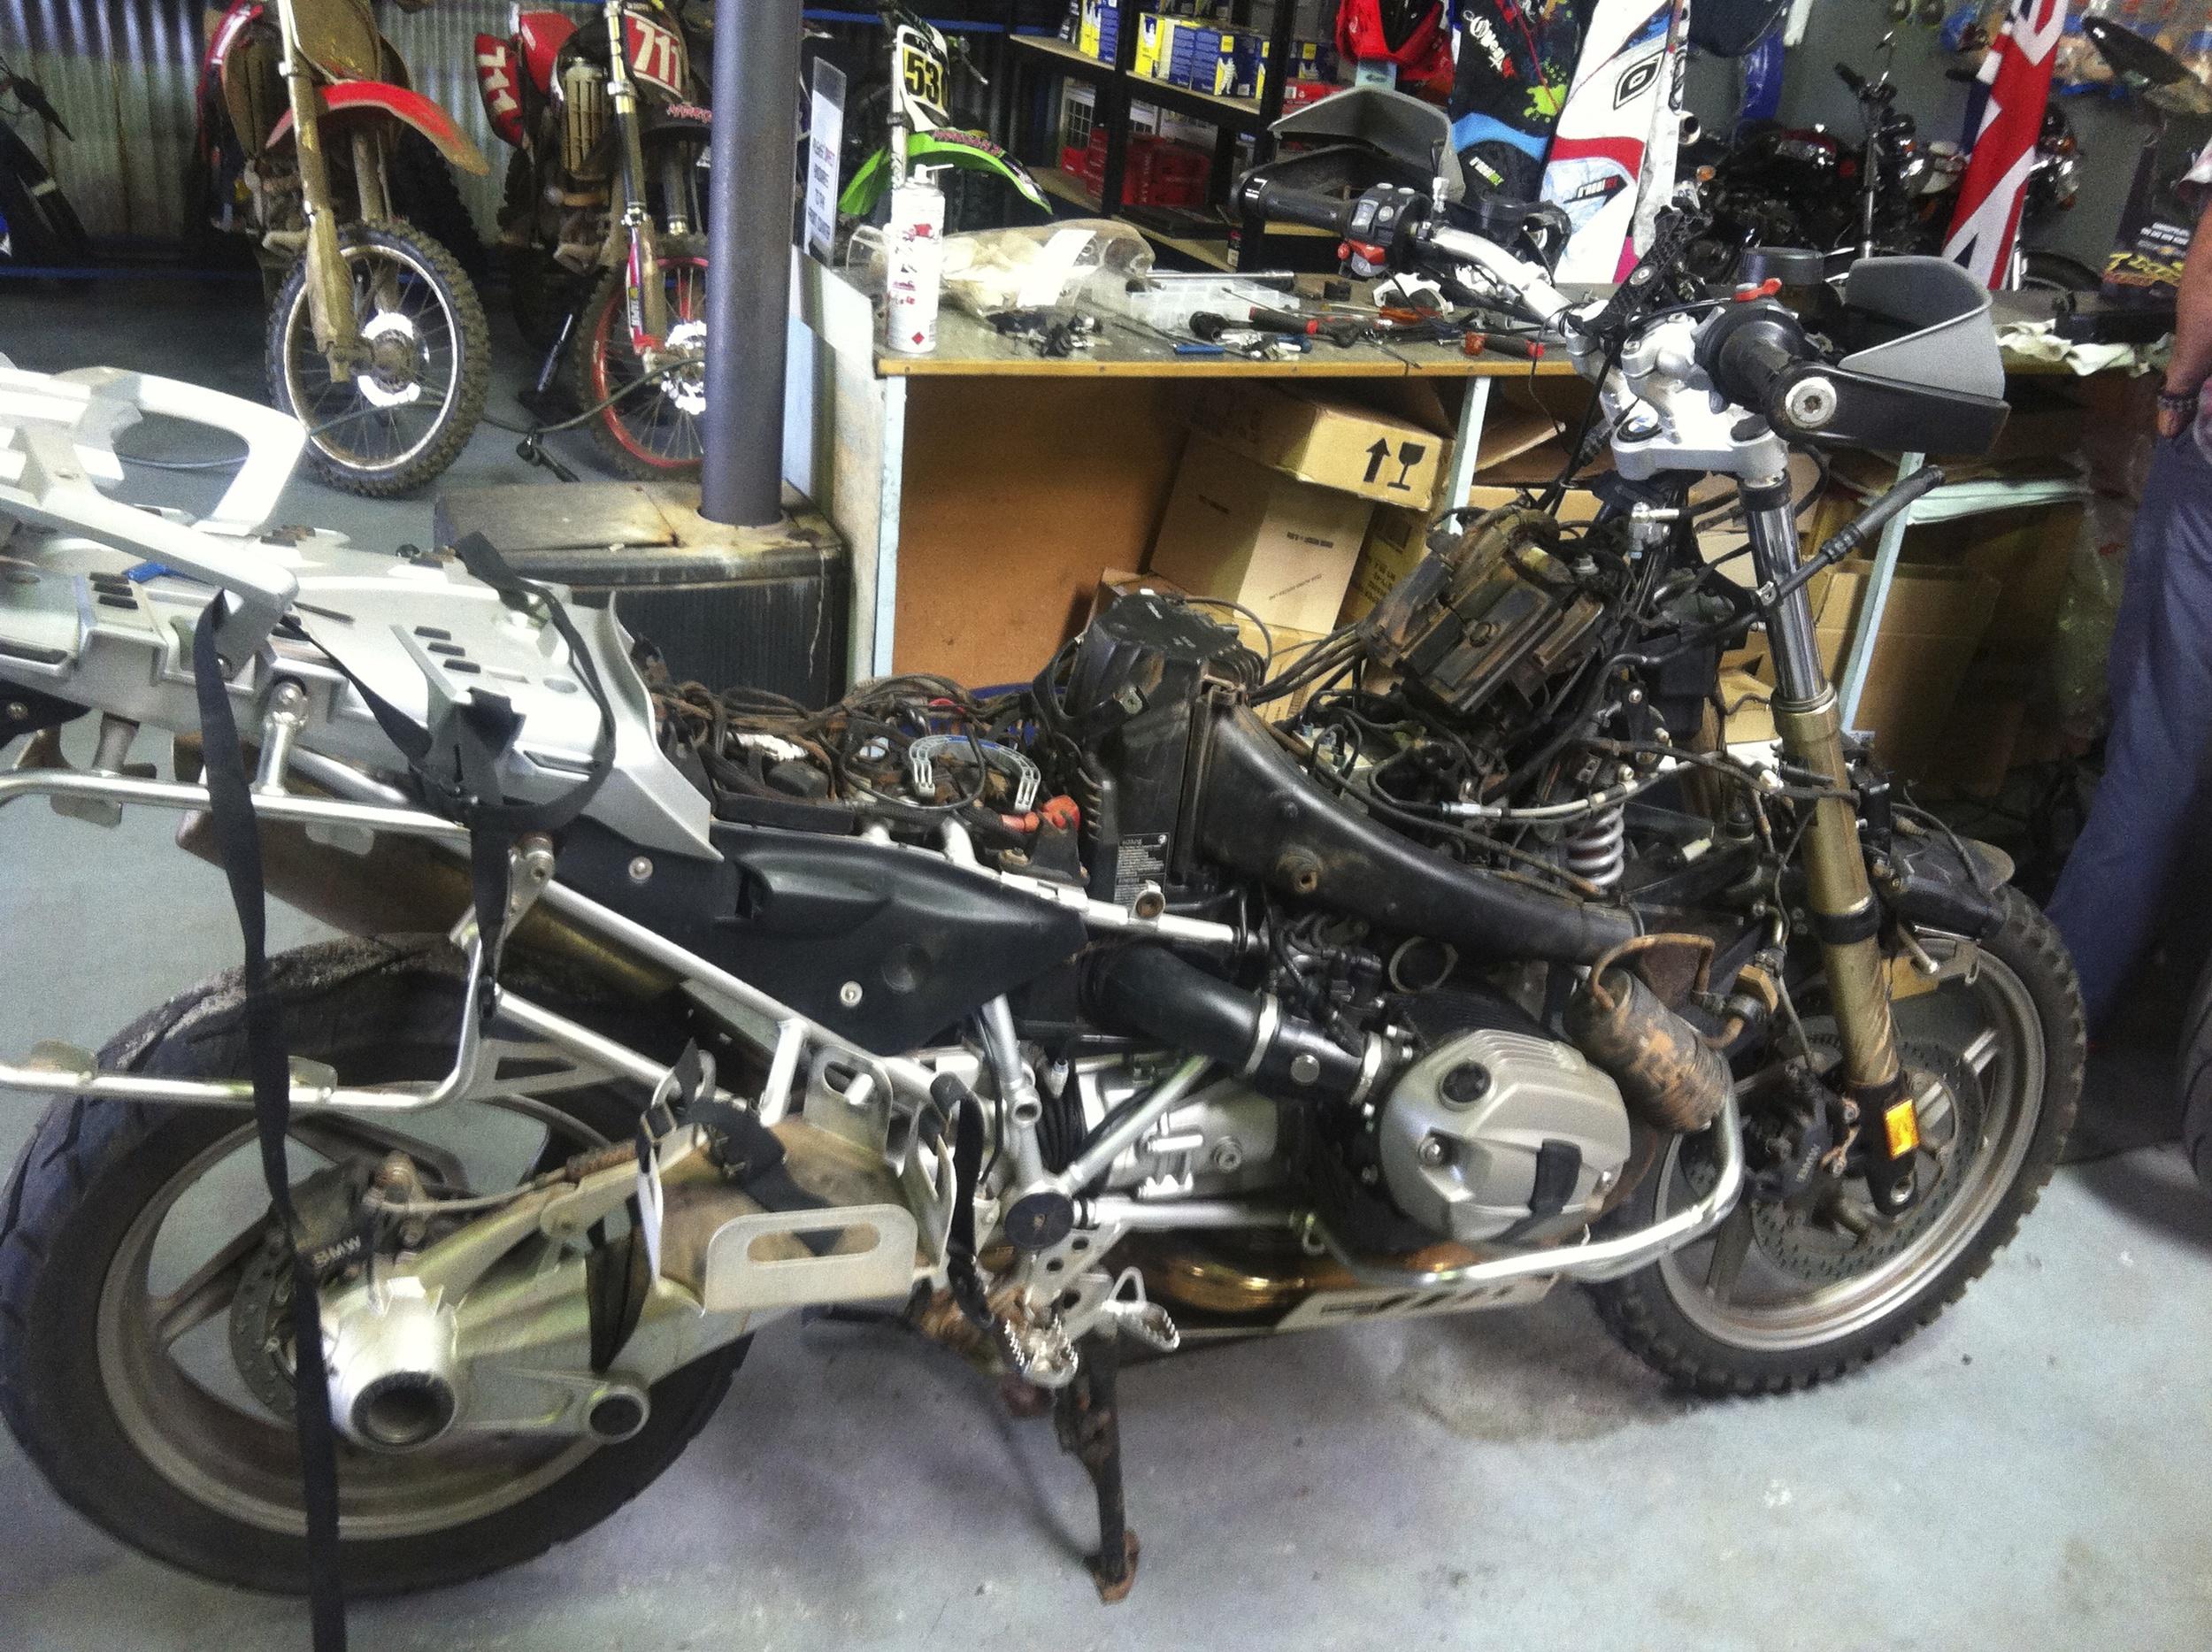 Kev's torn down bike.